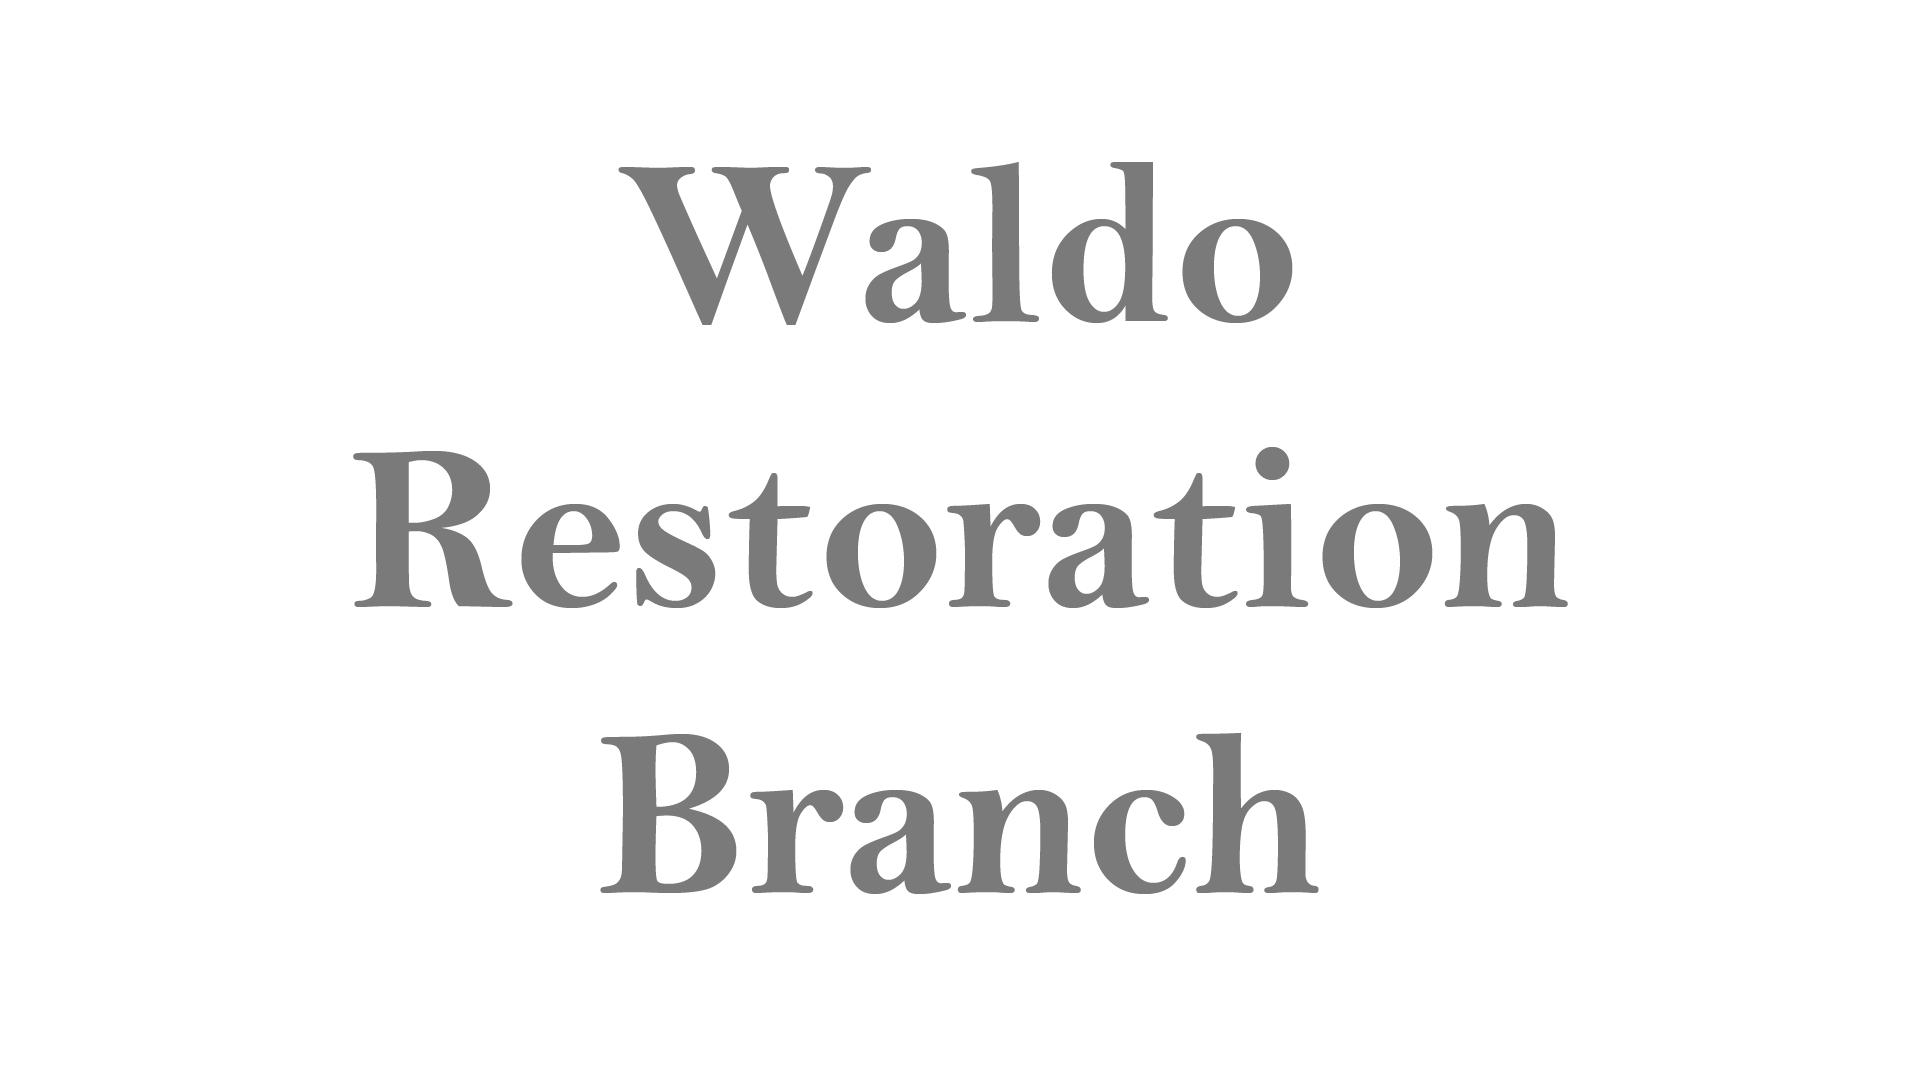 Waldo Restoration Branch